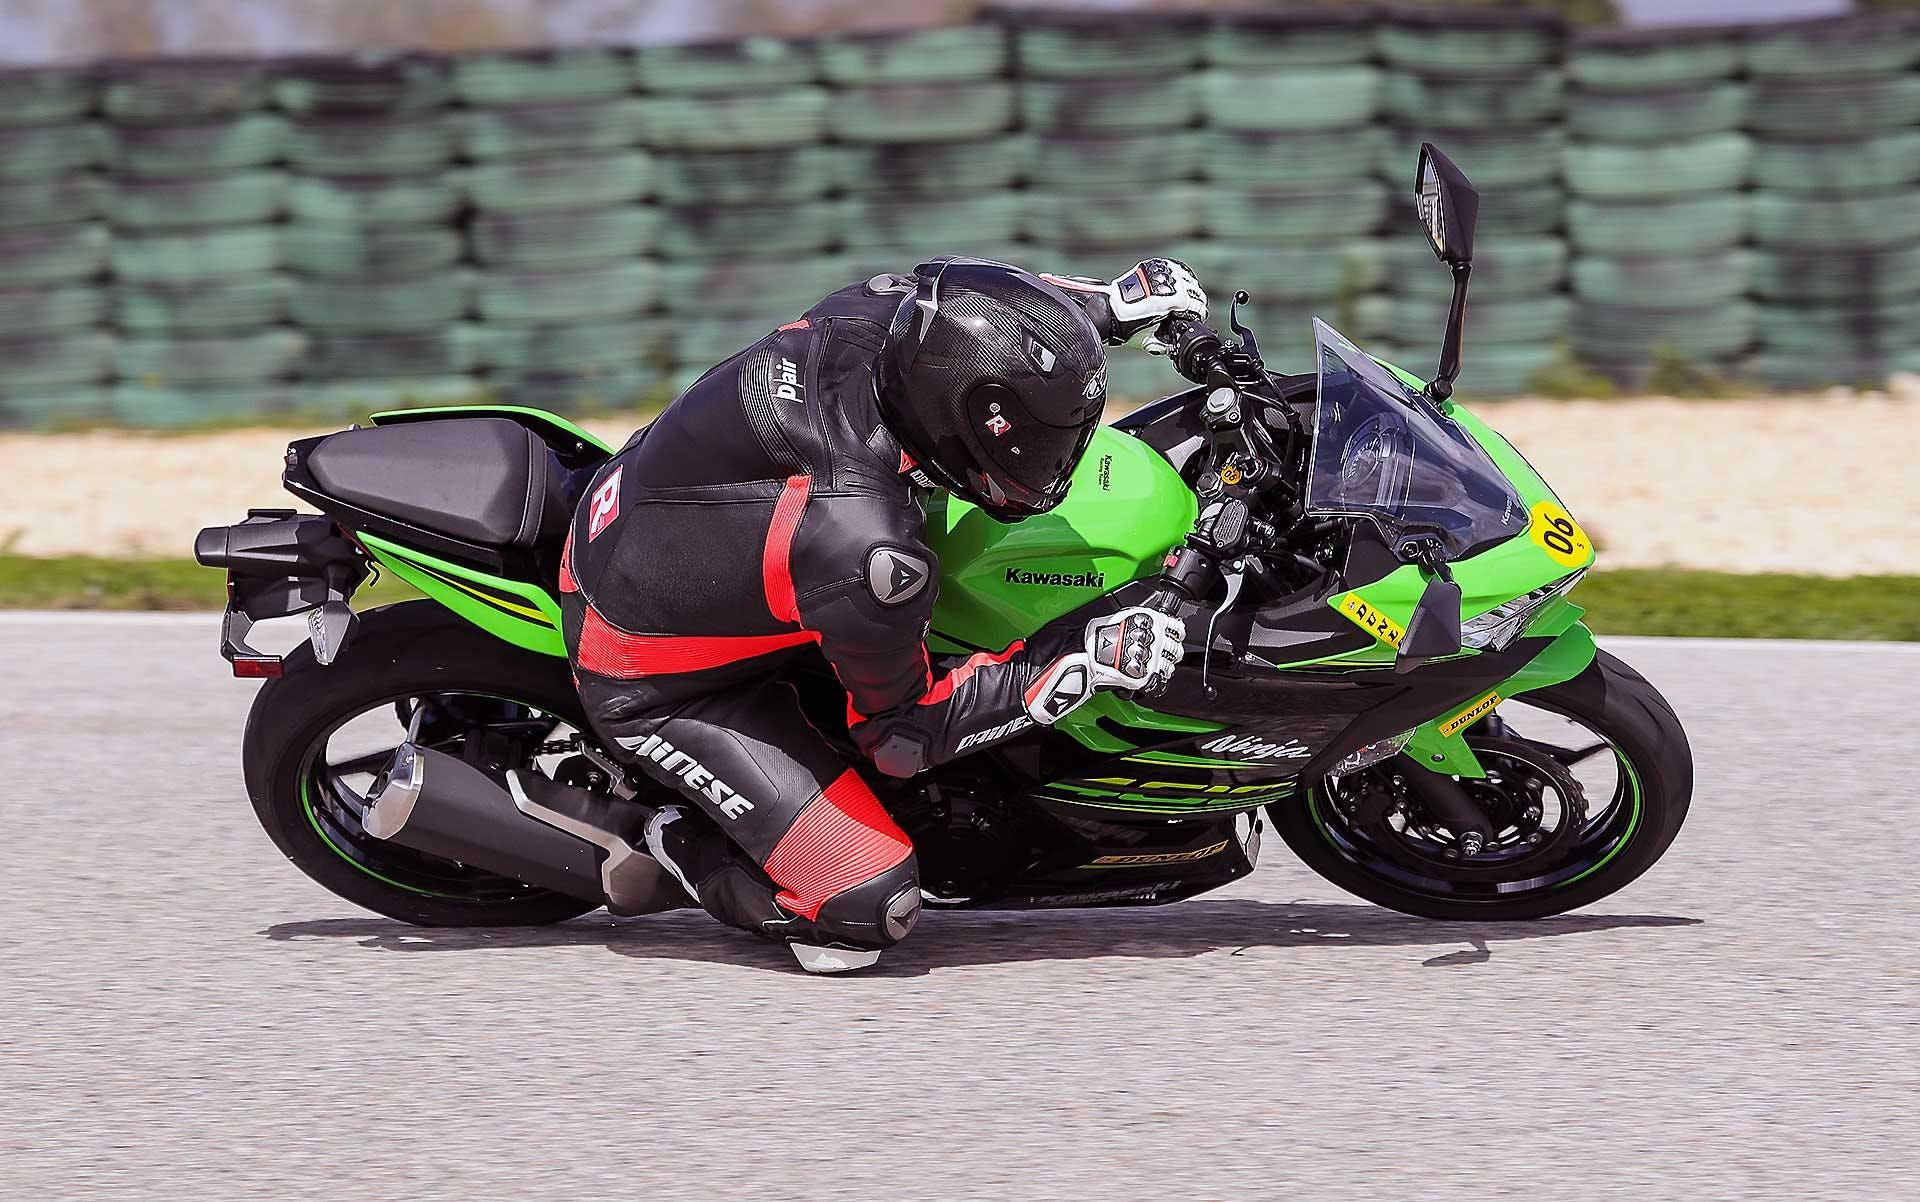 Dunlop SportSmart TT in pista con Kawasaki Ninja 400 Verde